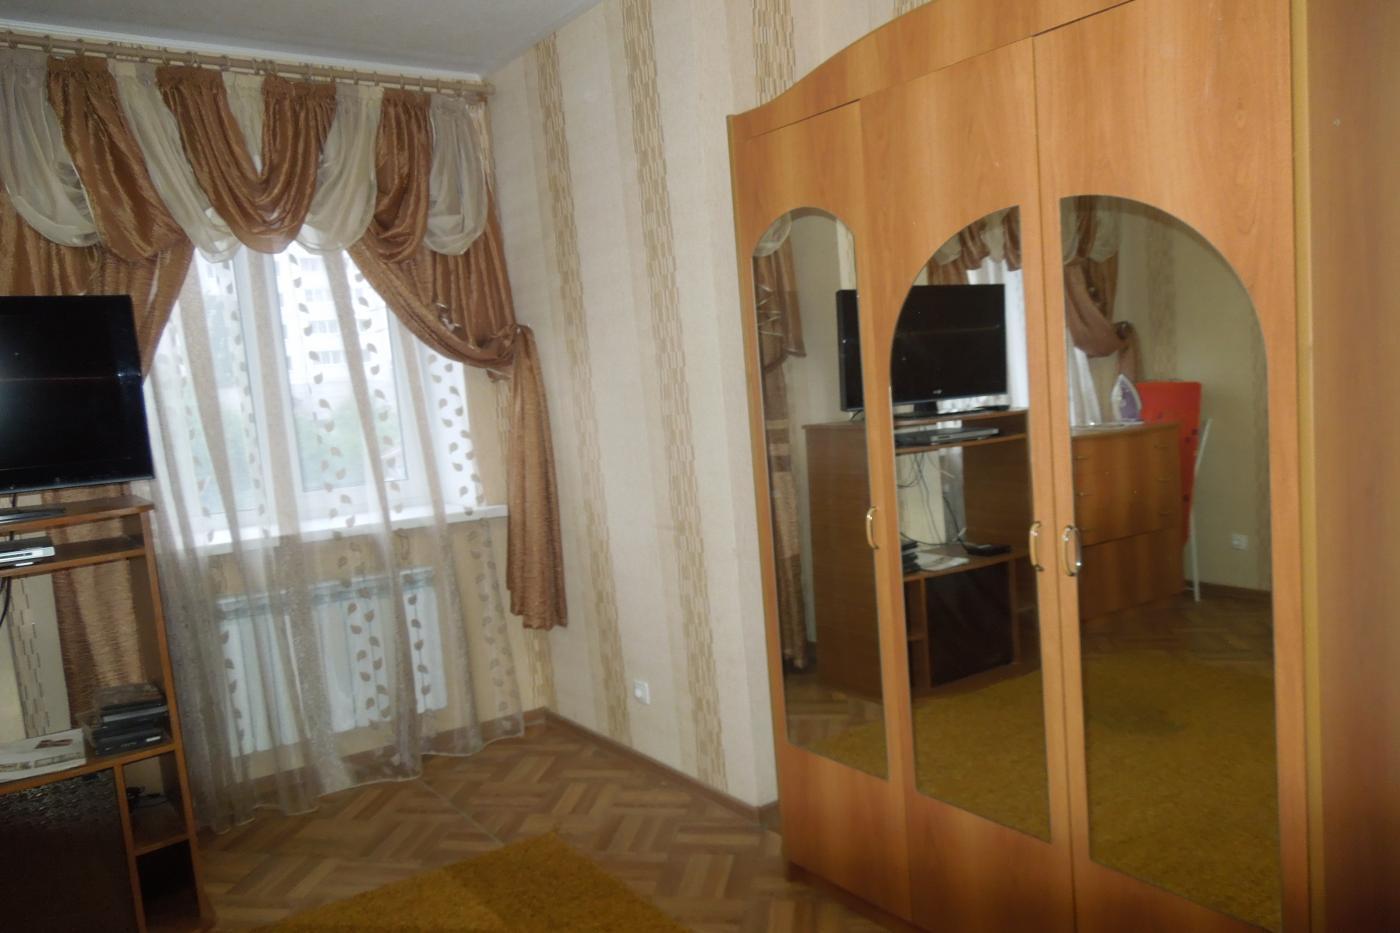 1-комнатная квартира посуточно (вариант № 1933), ул. Краснознаменная улица, фото № 2